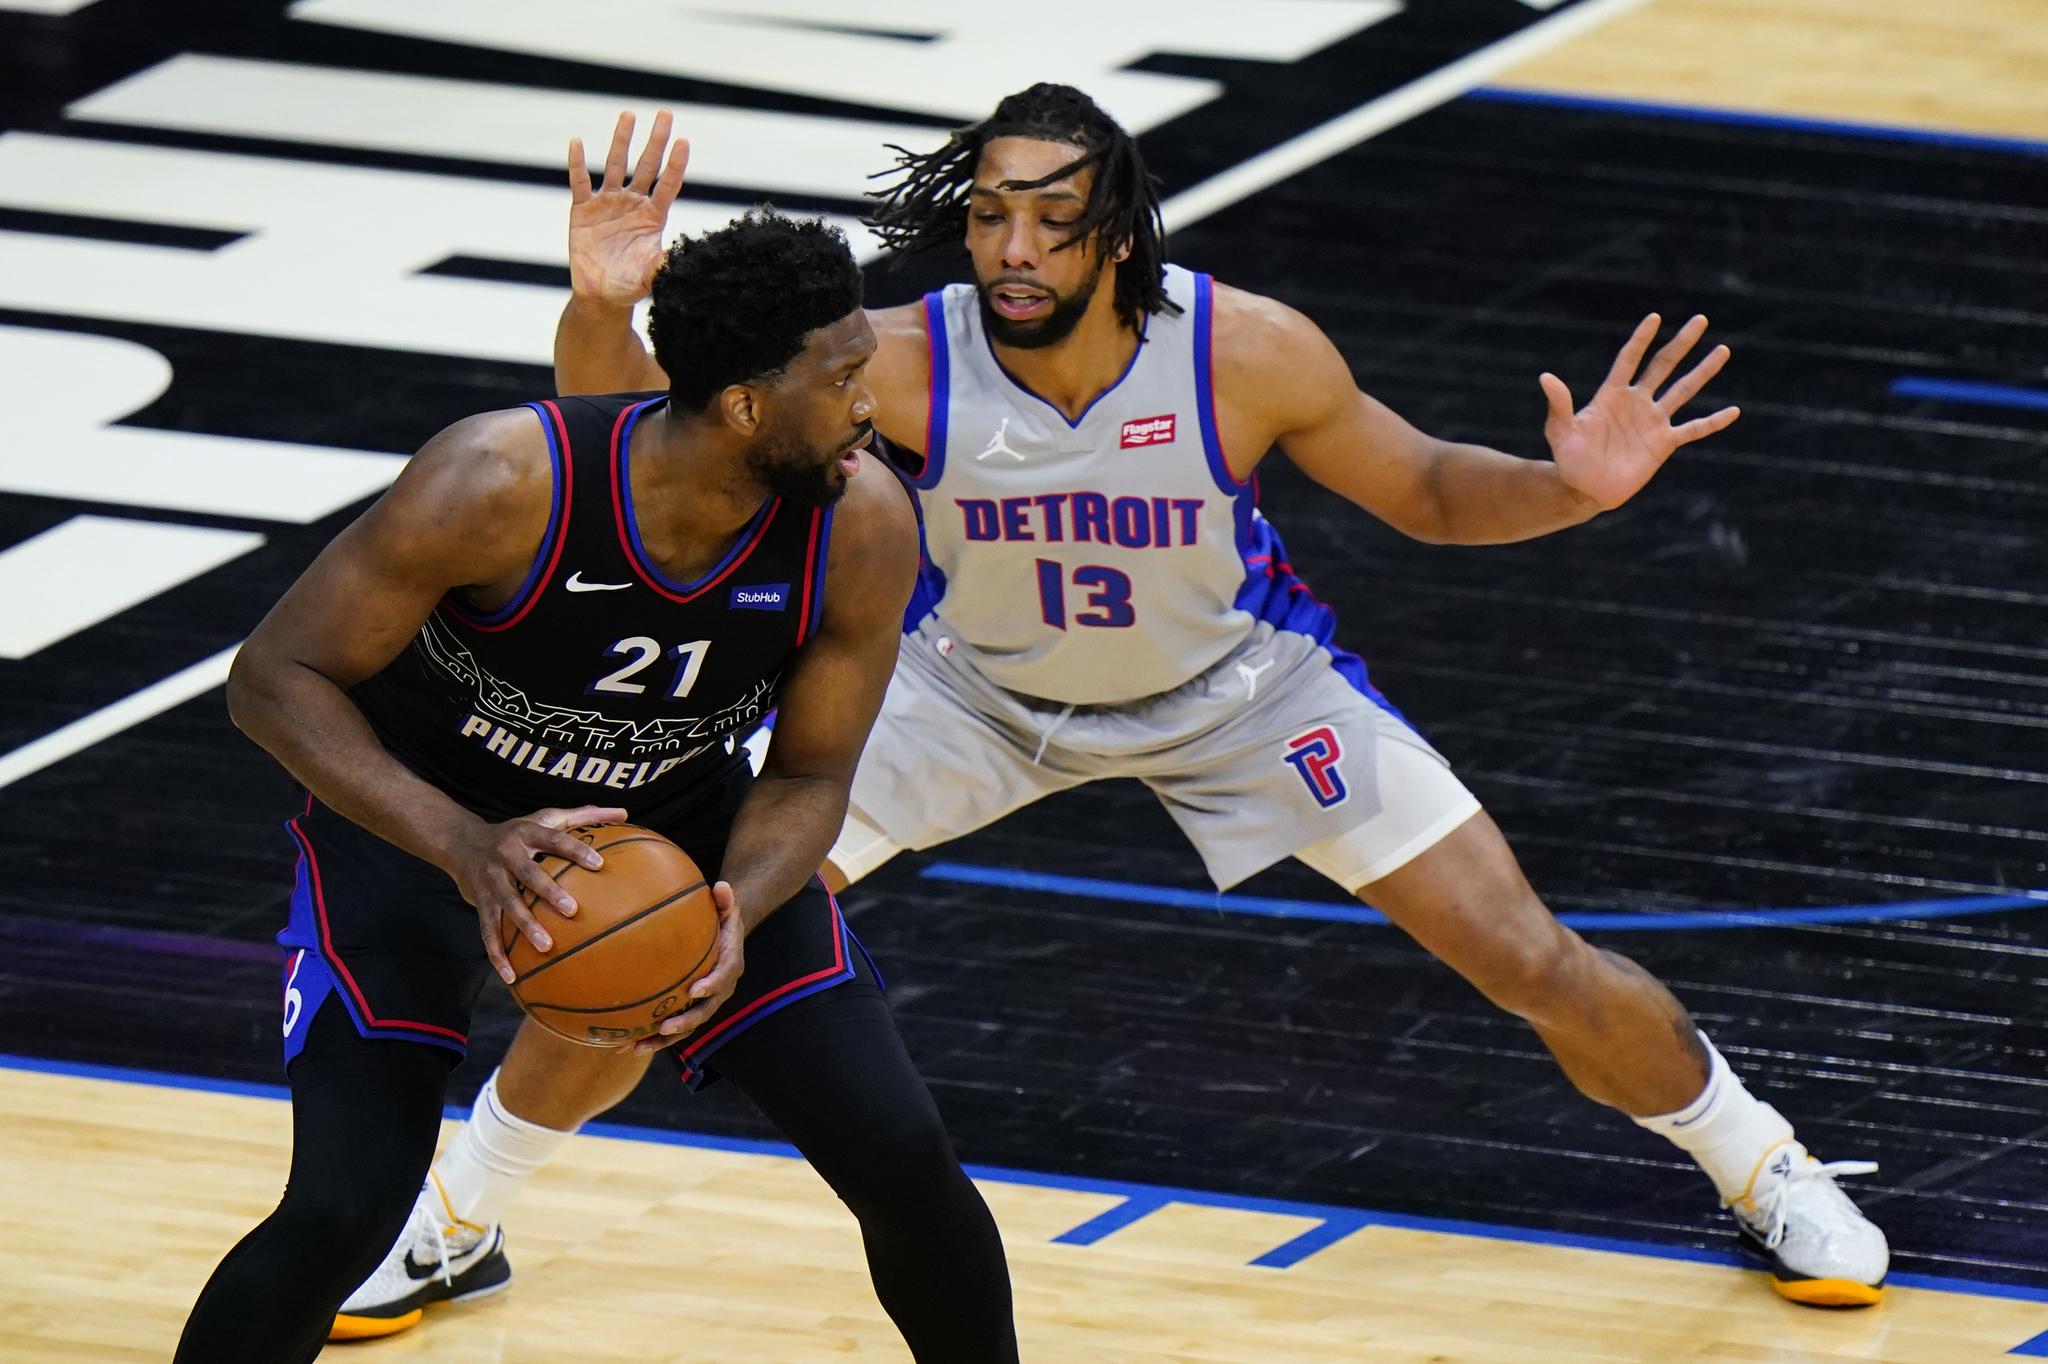 Philadelphia 76ers' Embiid tries to get around Detroit Pistons' Jahlil Okafor